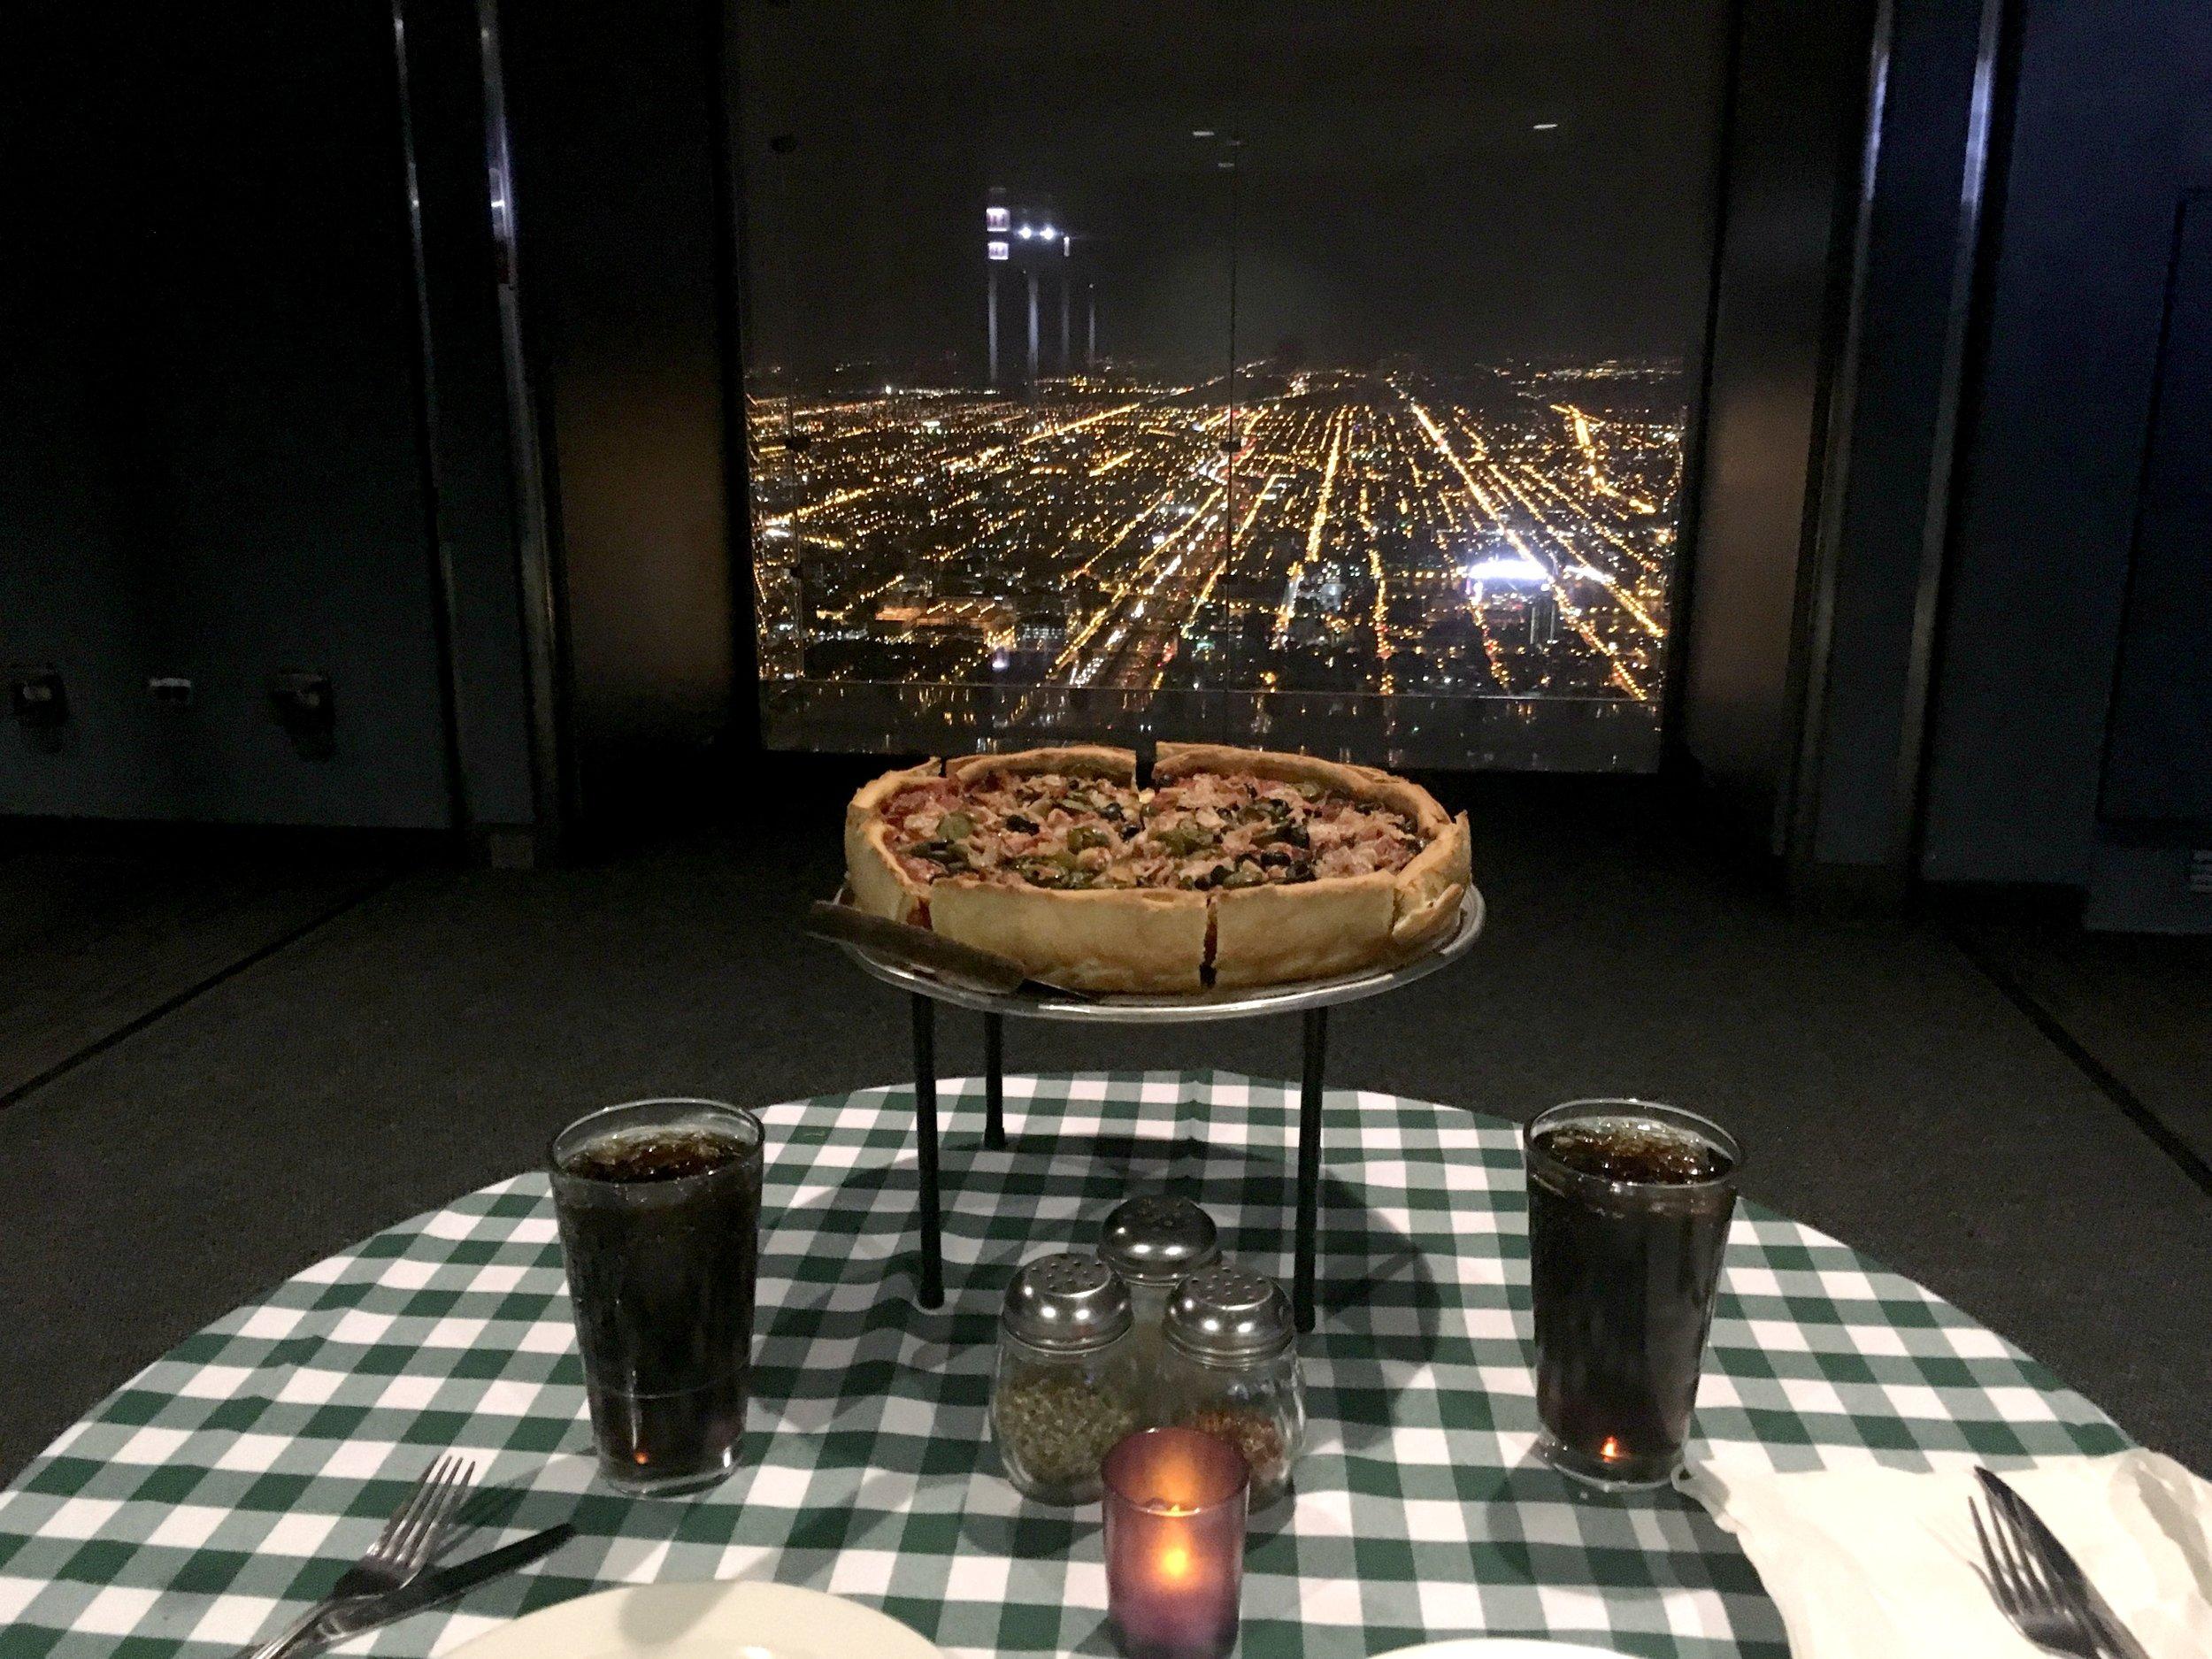 Skydeck Chicago Pie in the Sky Review - whatthegirlssay.com